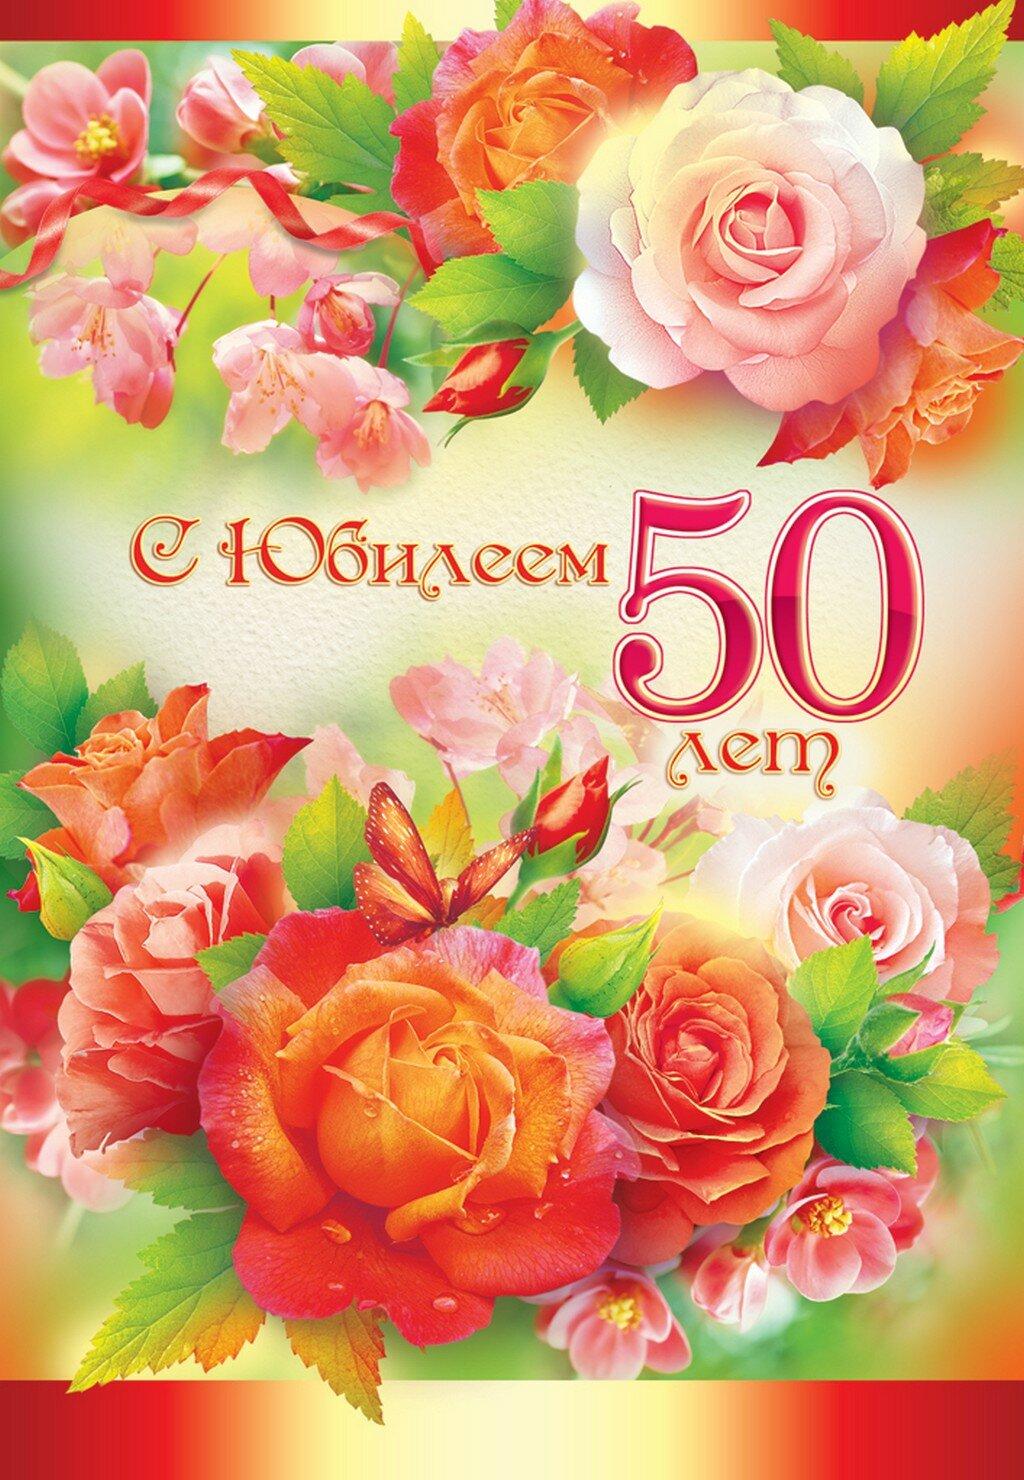 Открытки 50 лет женщину, открыток файлы открытка